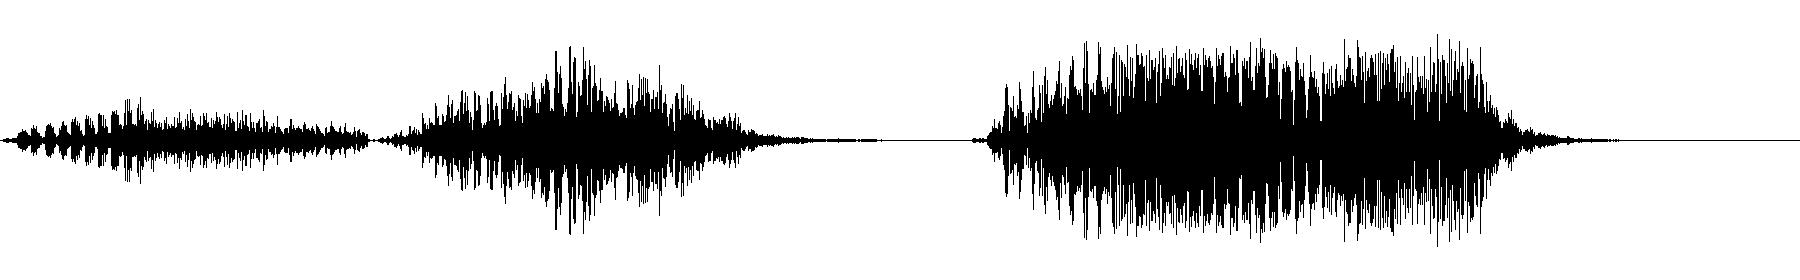 vox 008